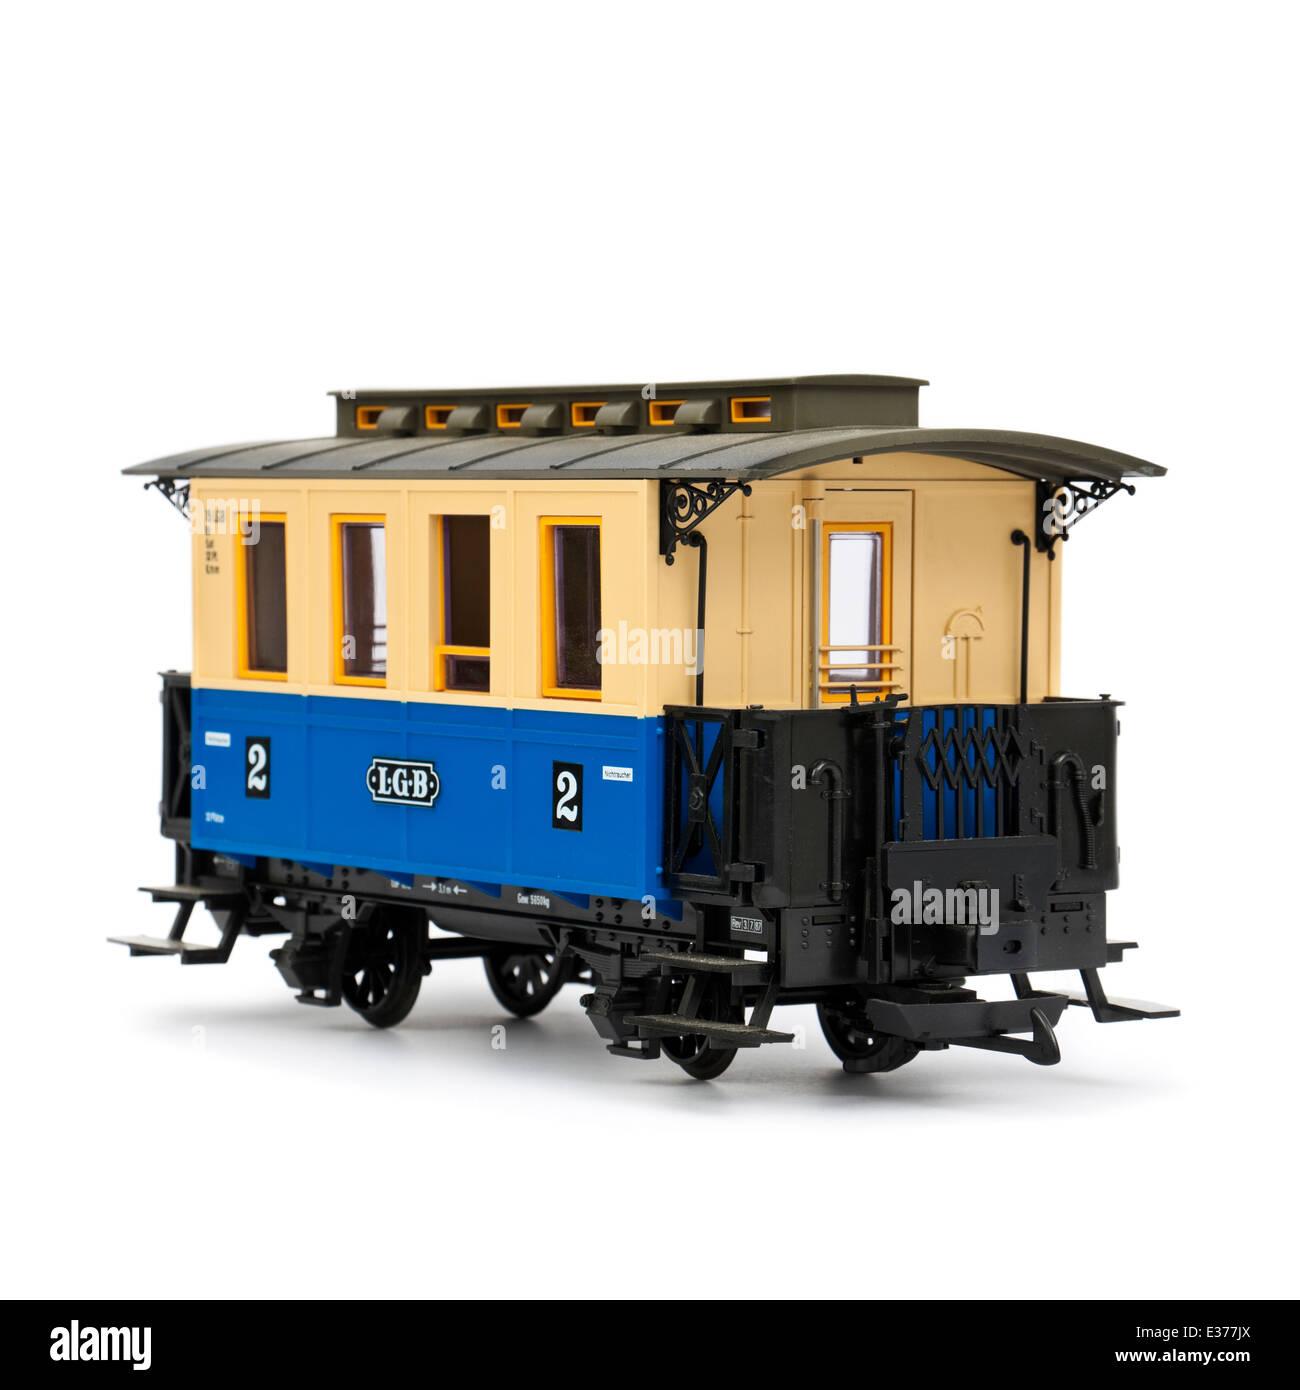 LGB (Lehmann Garden Railway) G-Scale model passenger coach - Stock Image